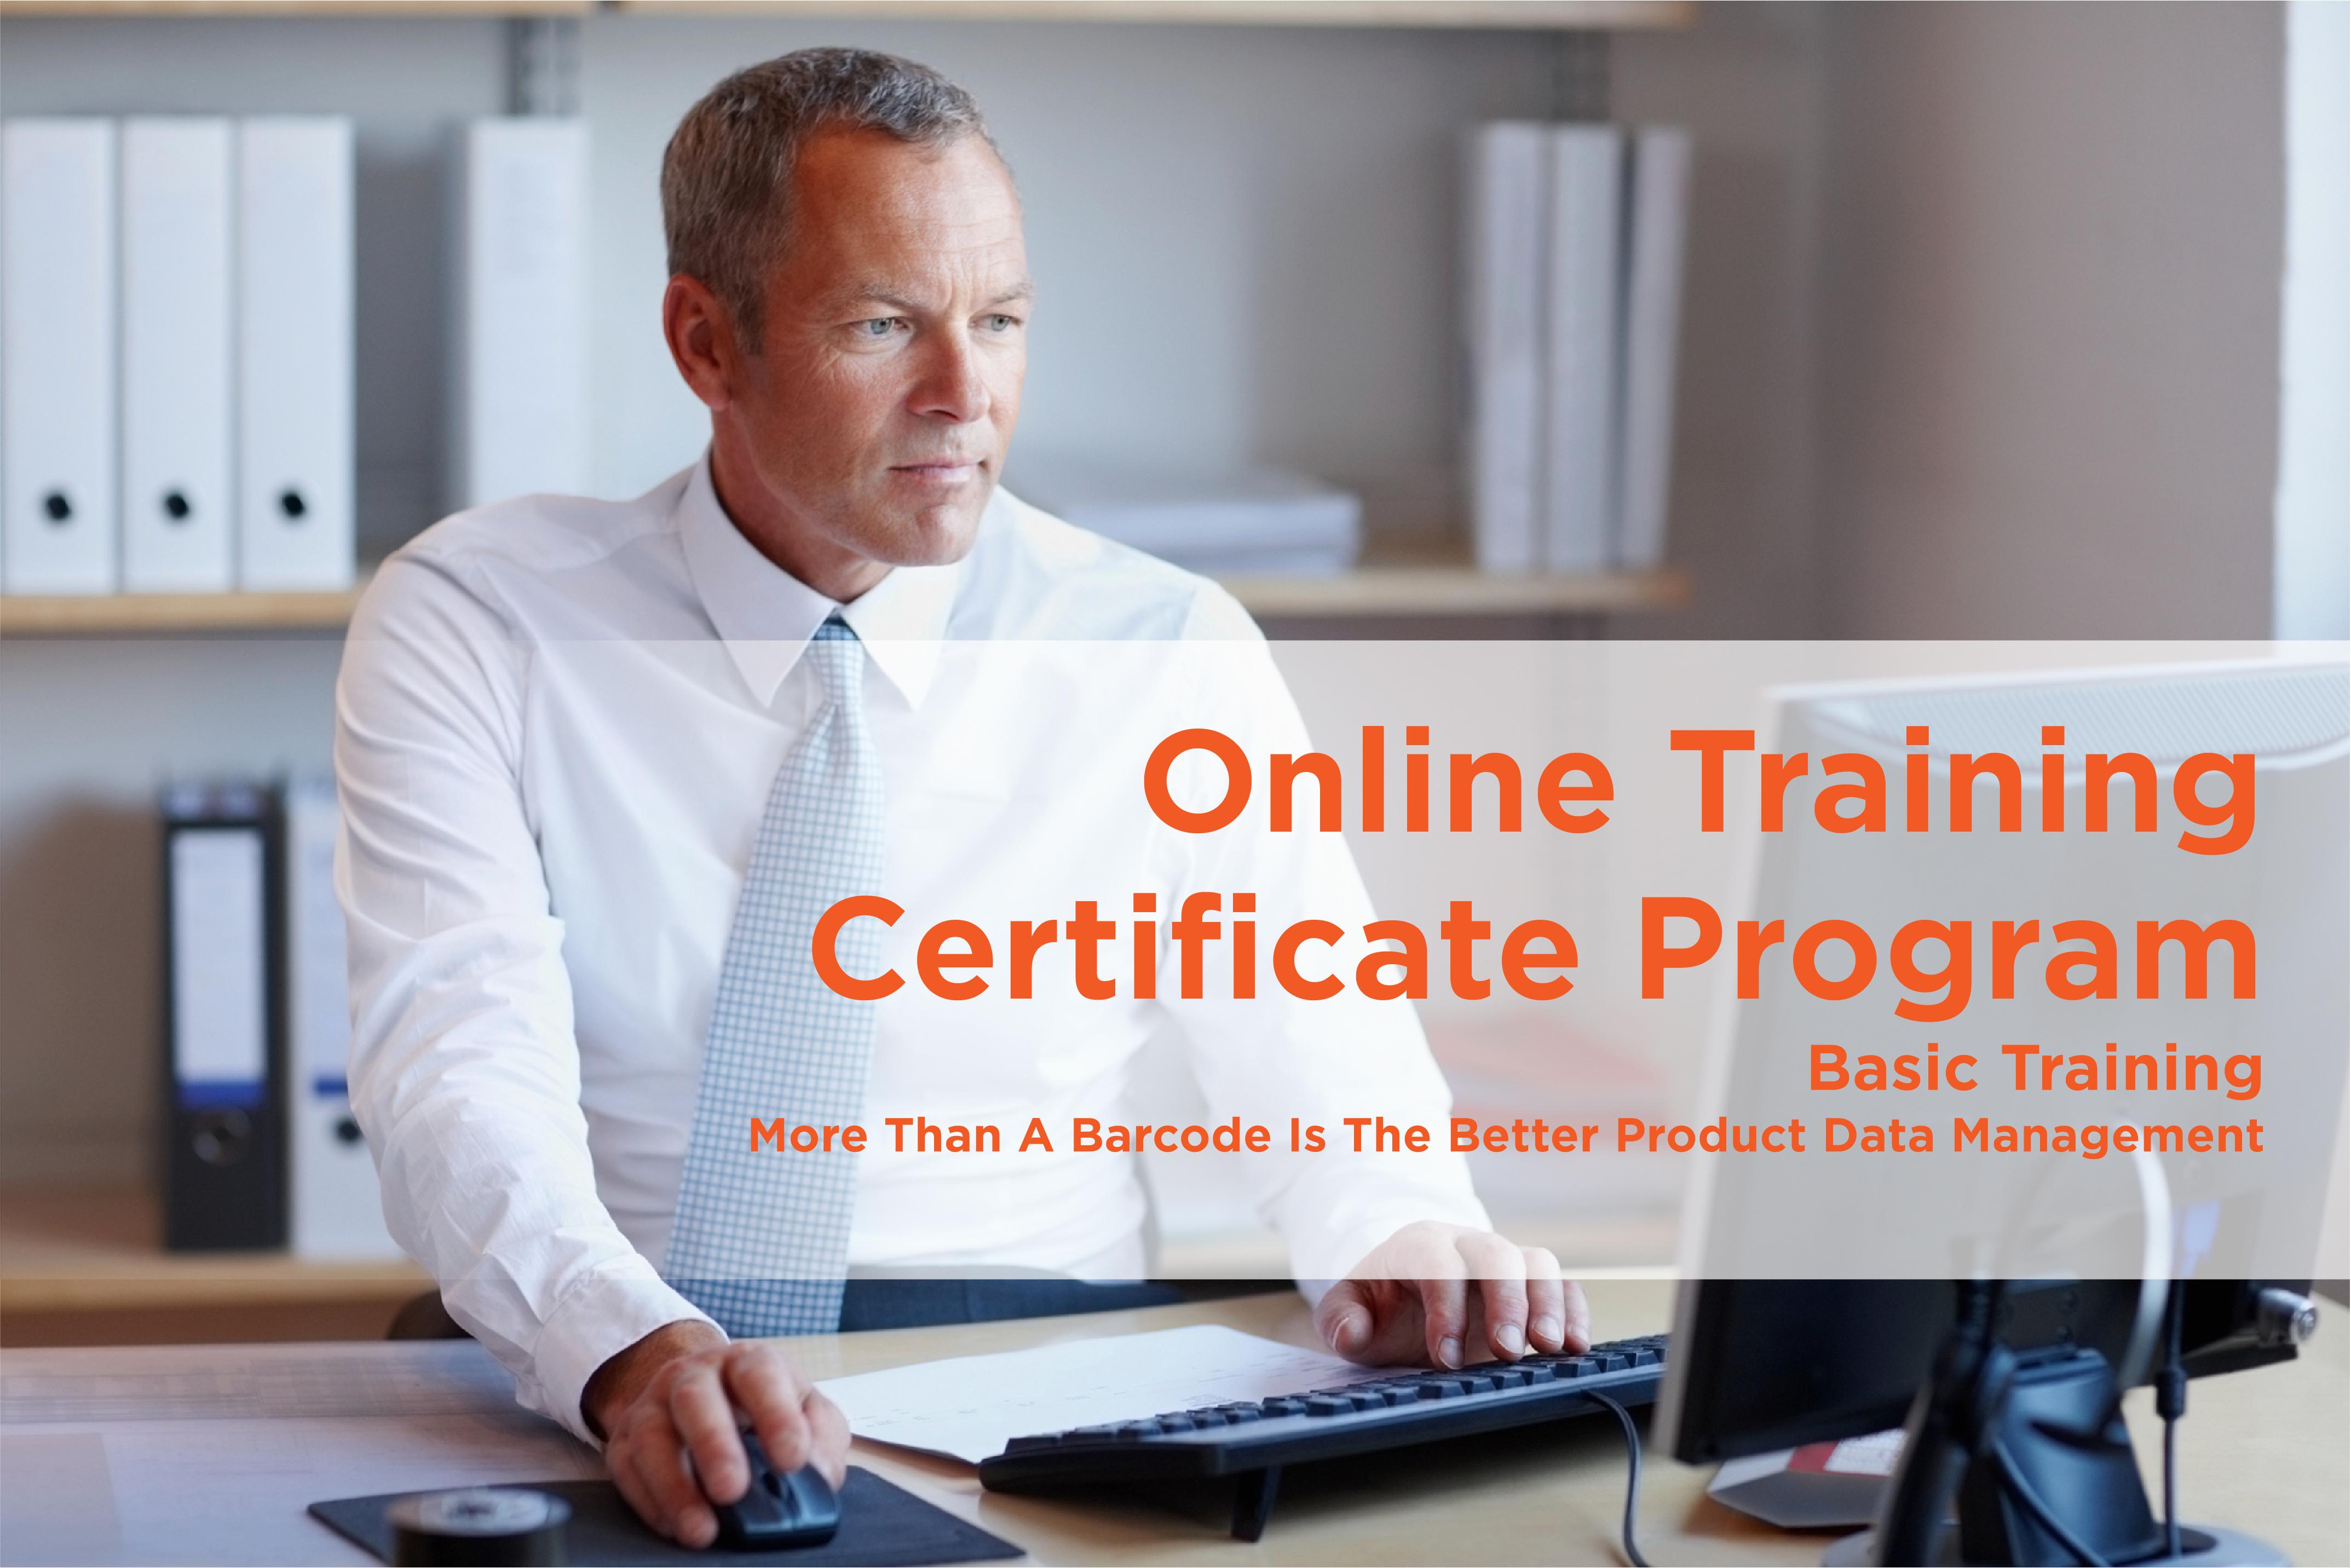 Online Training หลักสูตรมากกว่าสัญลักษณ์บาร์โค้ด คือการบริหารจัดการข้อมูลสินค้าที่ดียิ่งขึ้น – More Than A Barcode Is The Better Product Data Management (Basic Training – Certificate Program)